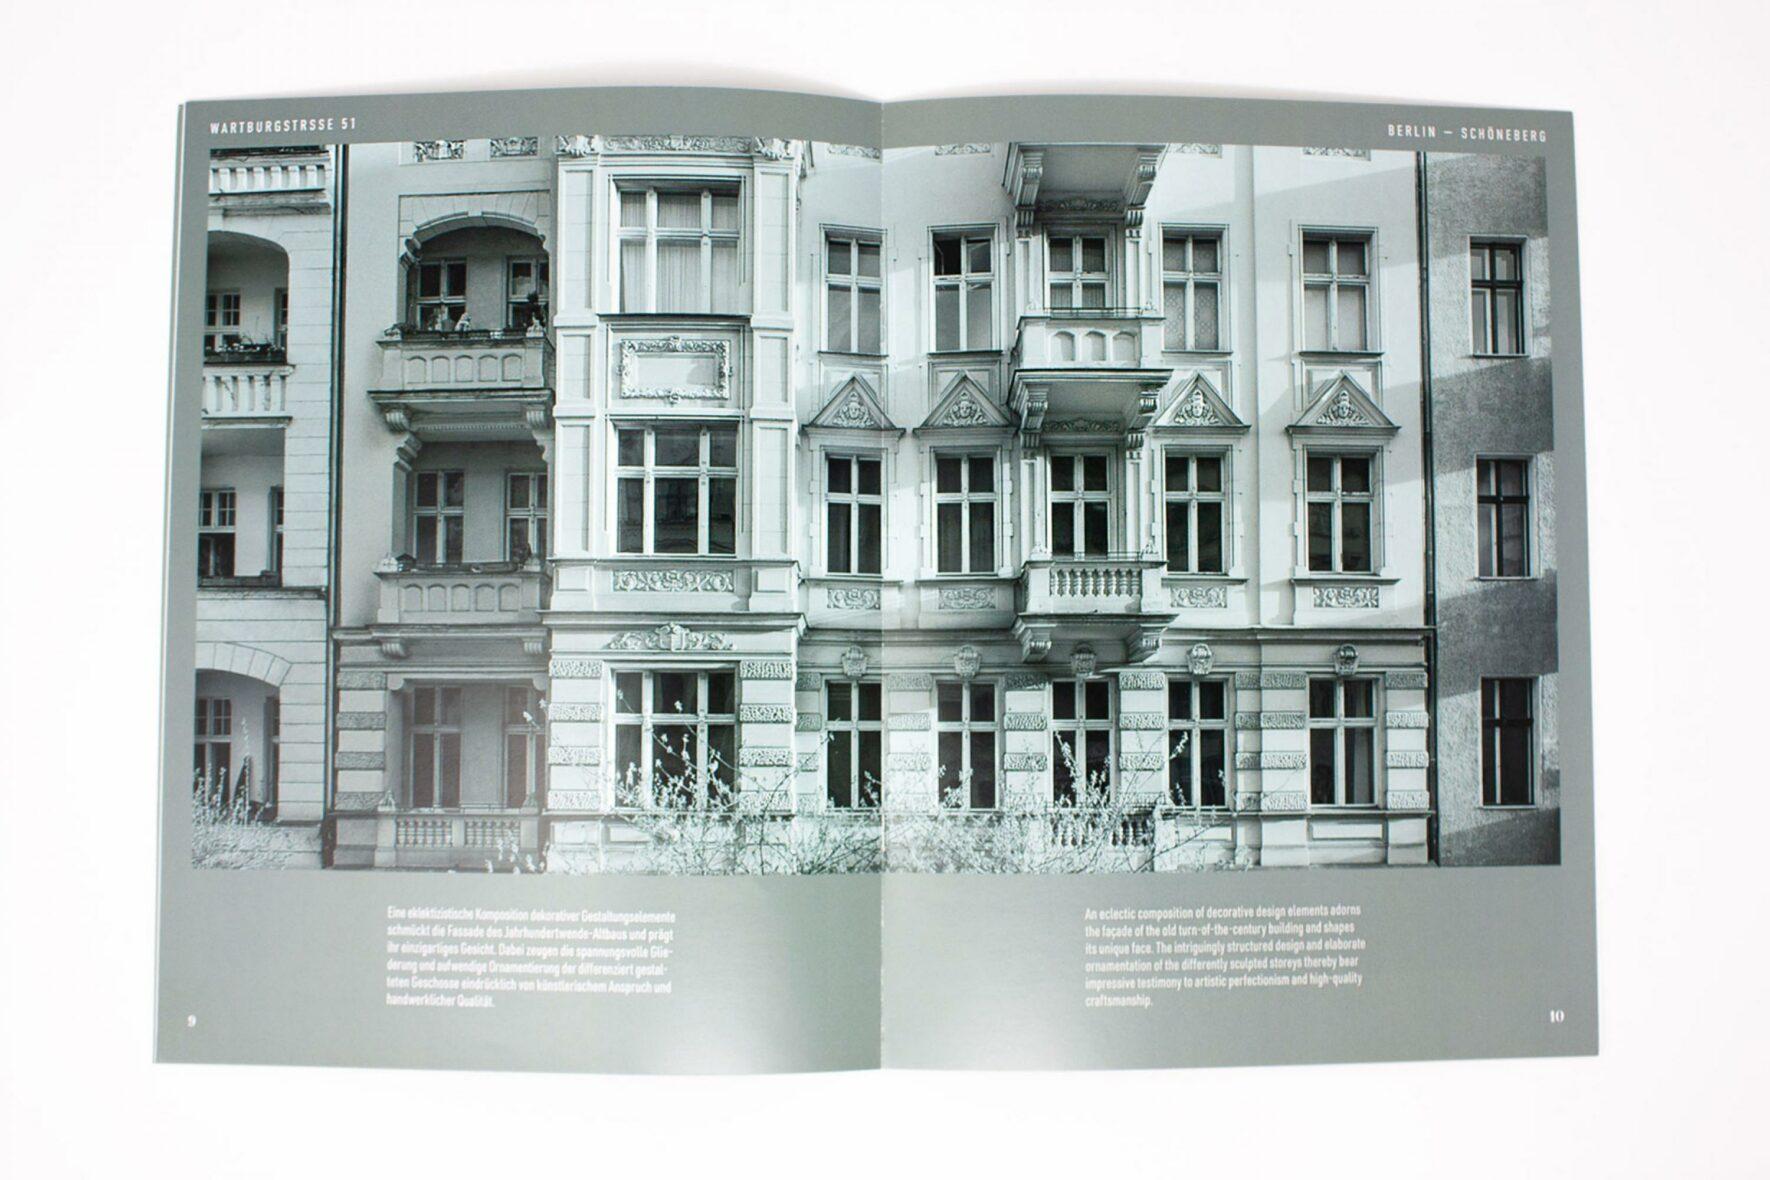 Immobilienbranding-wartburg-Trendcity-Broschüre-FORMLOS-berlin_MG_8296